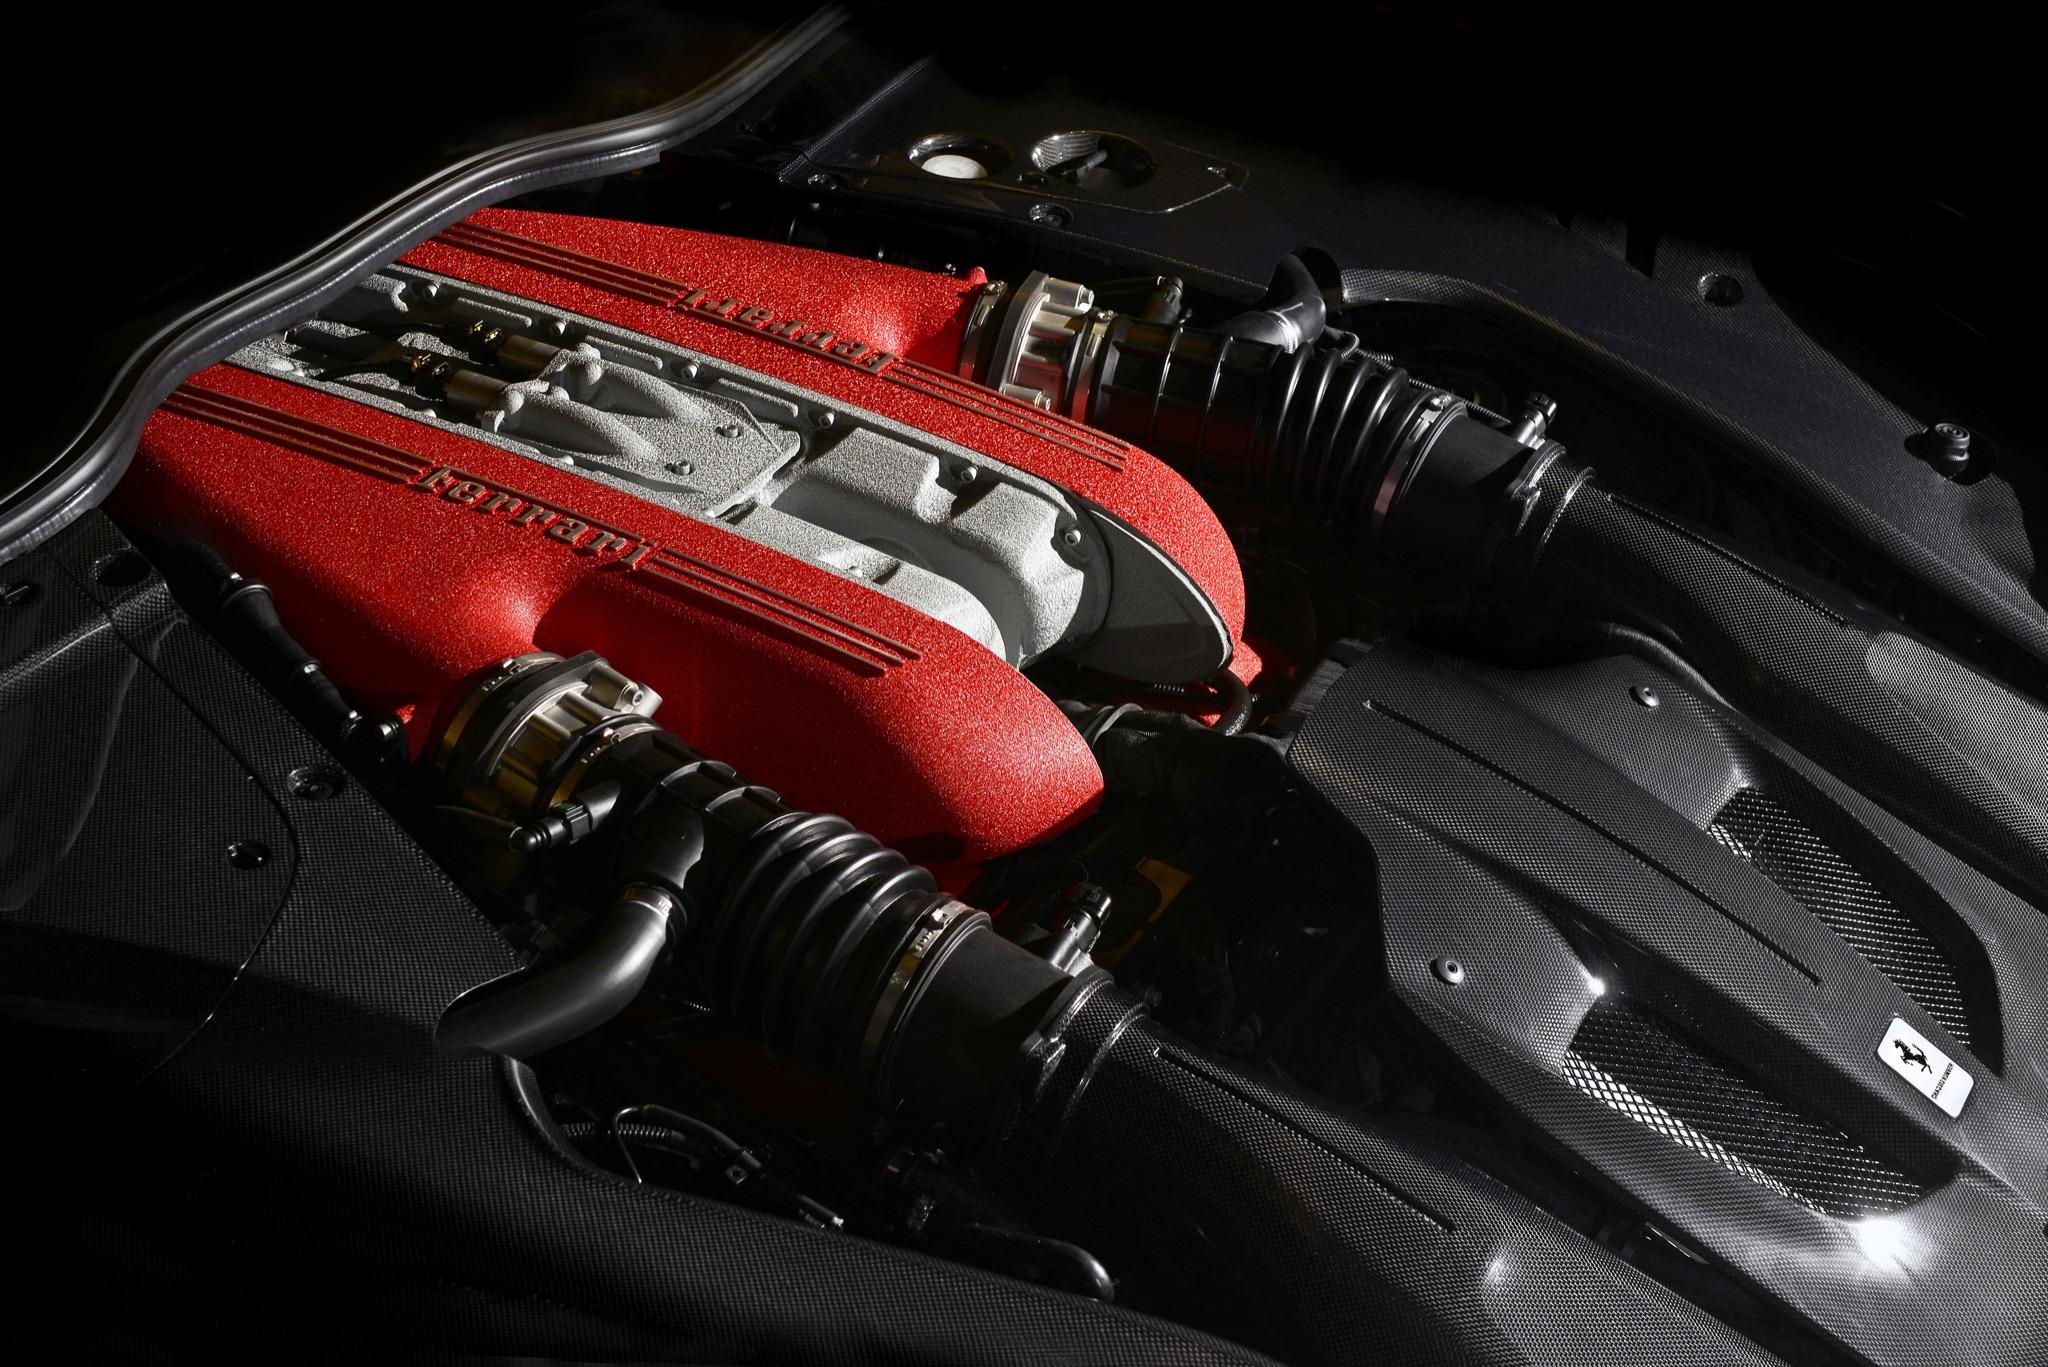 FerrariF12tdf 06